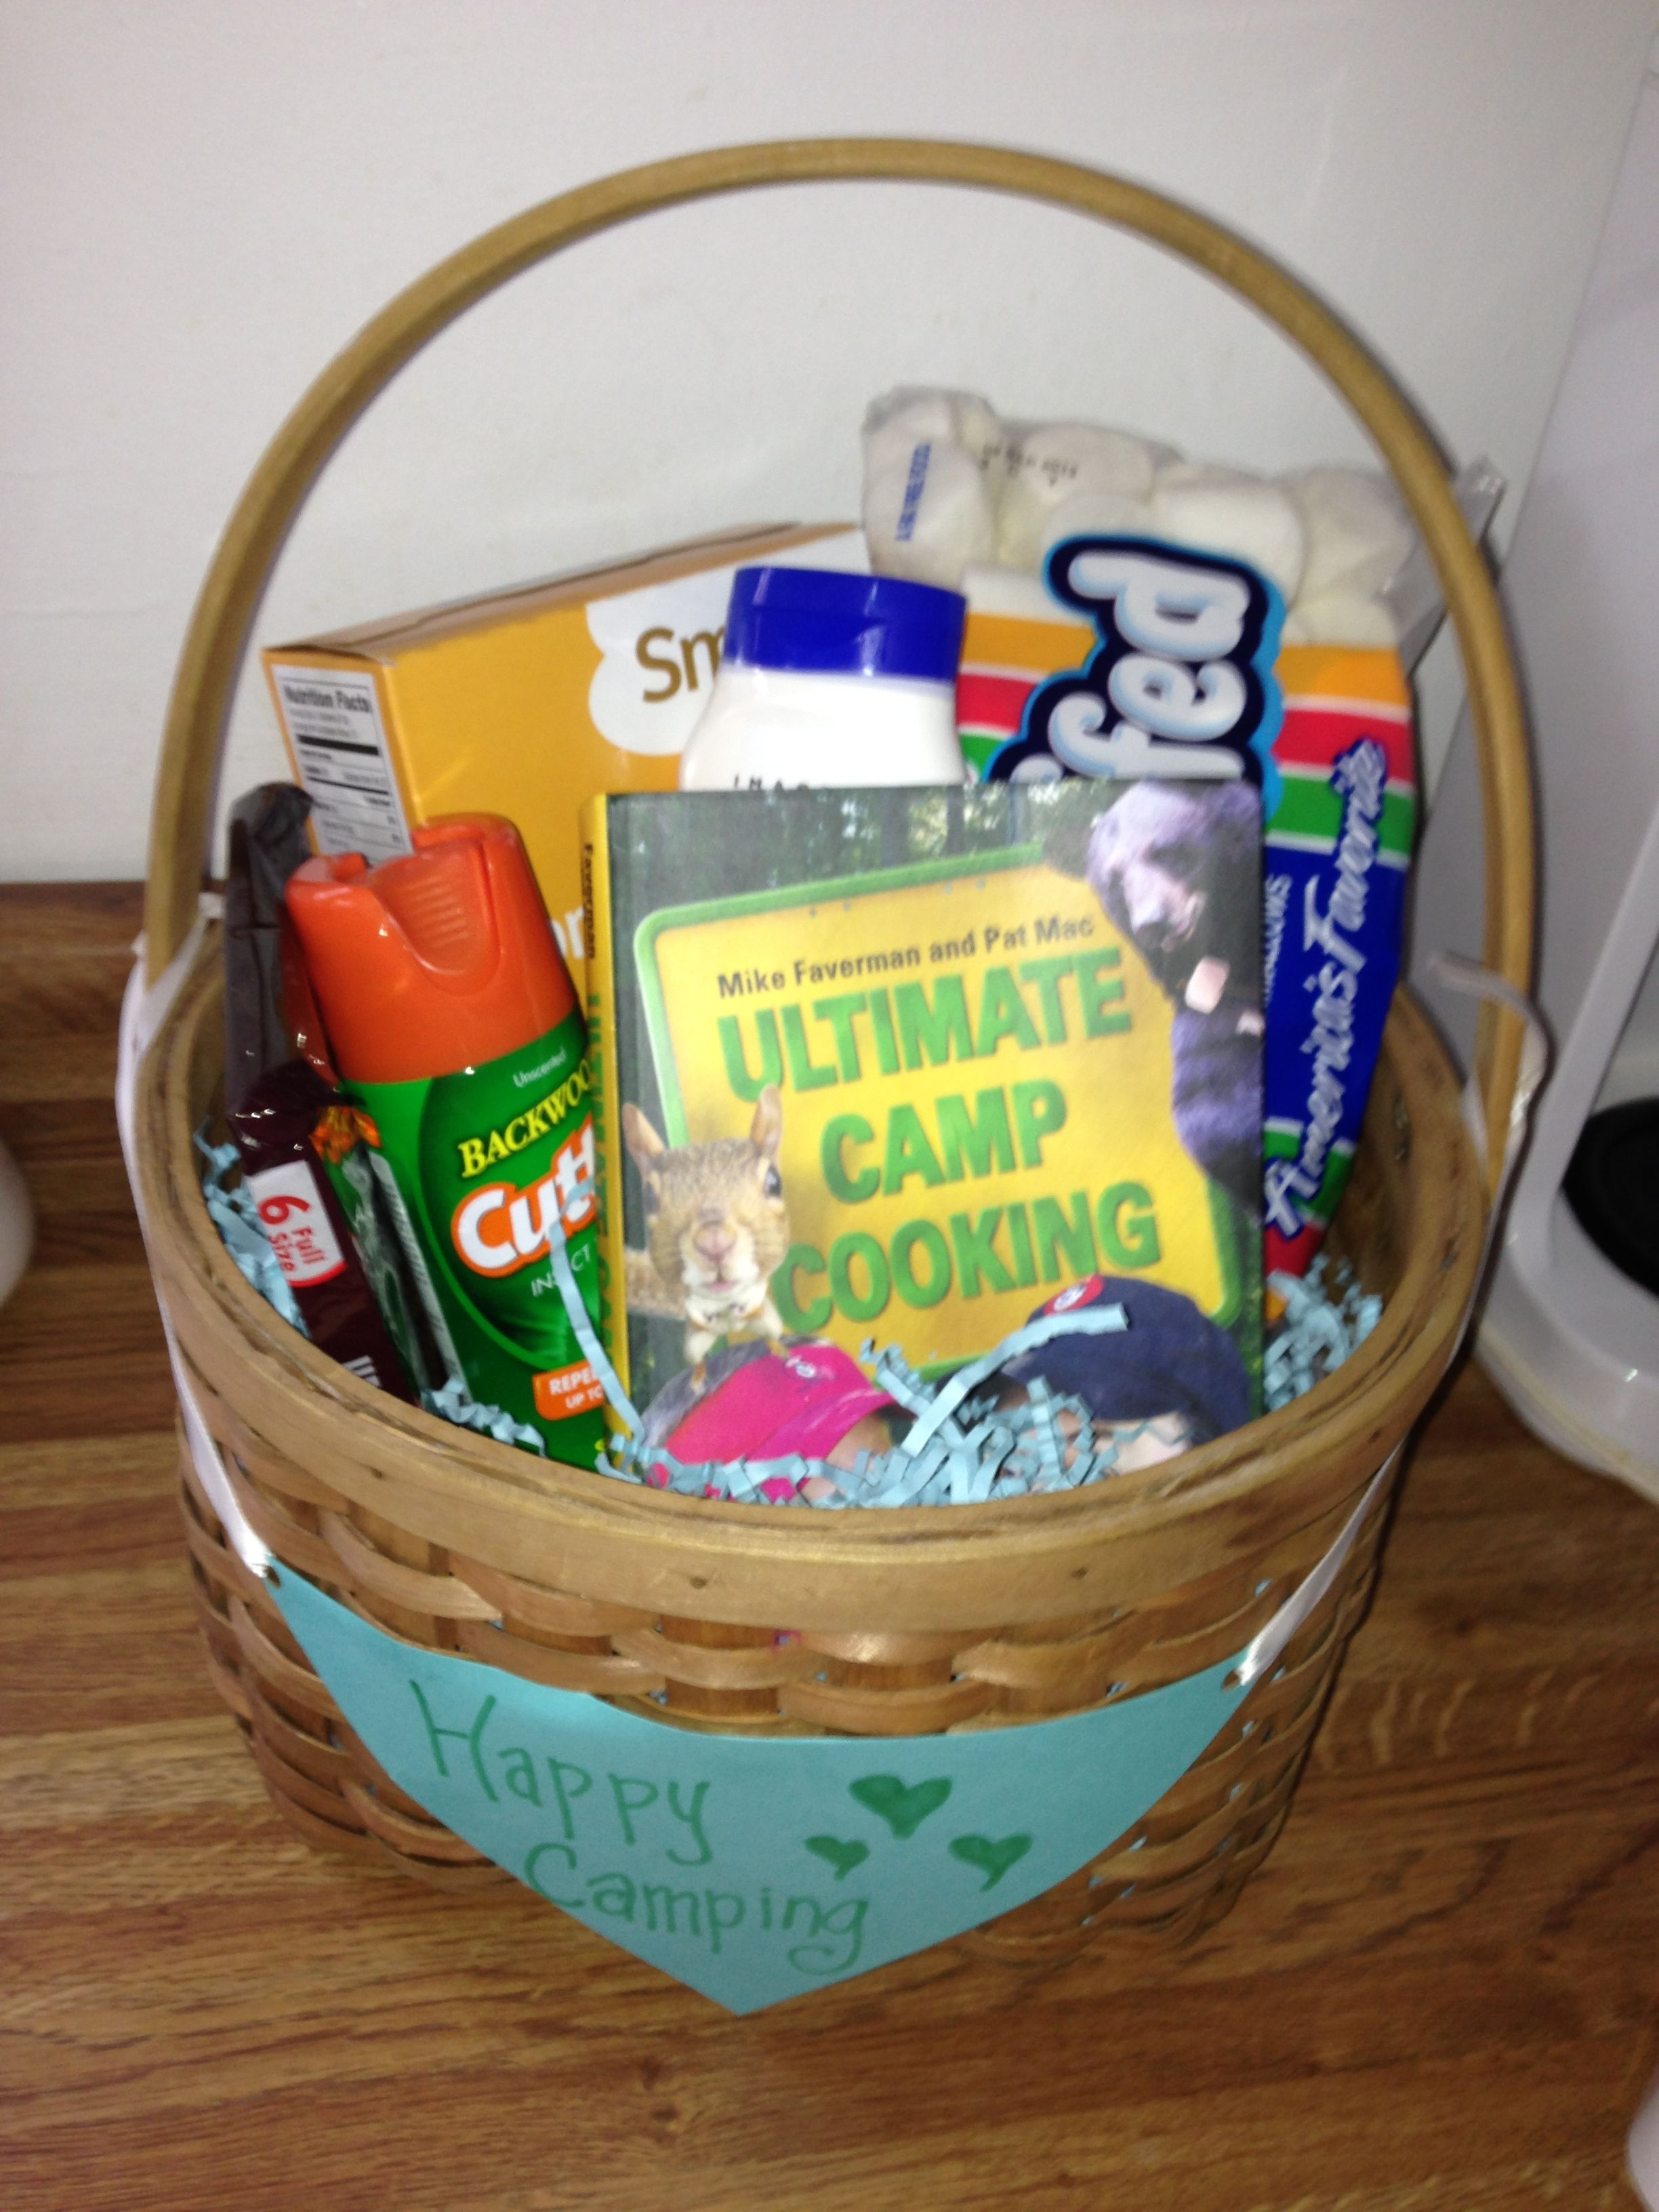 Campfire gift basket